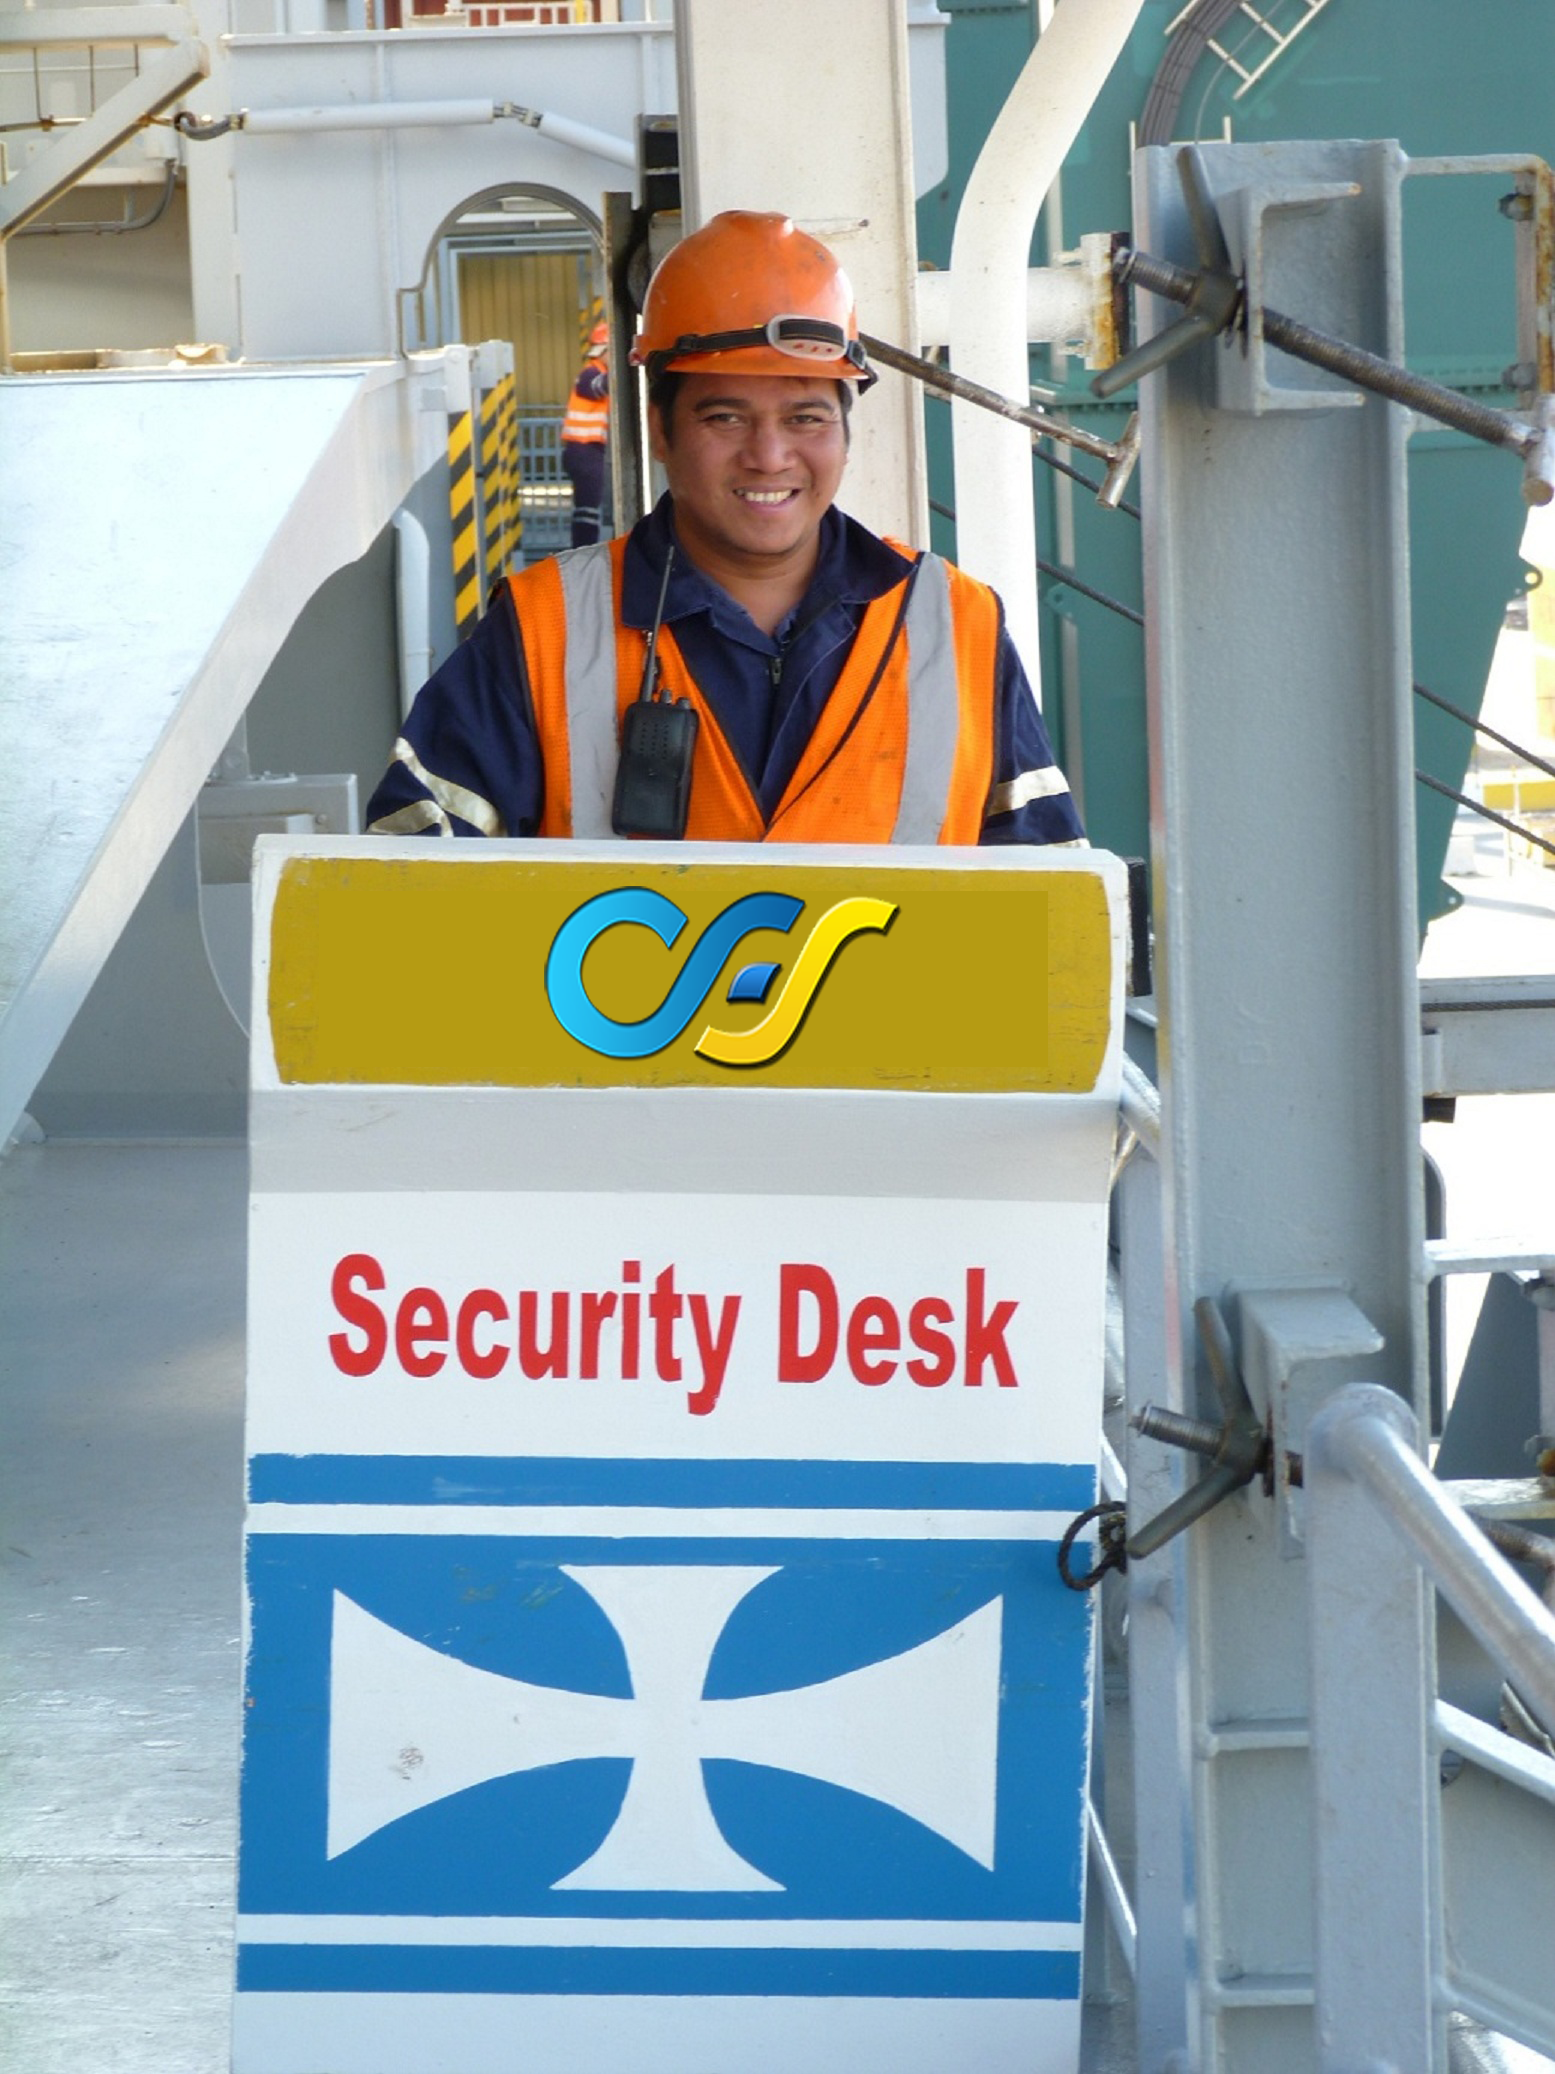 Deck & Engine Job Openings - CFSharp Crewing